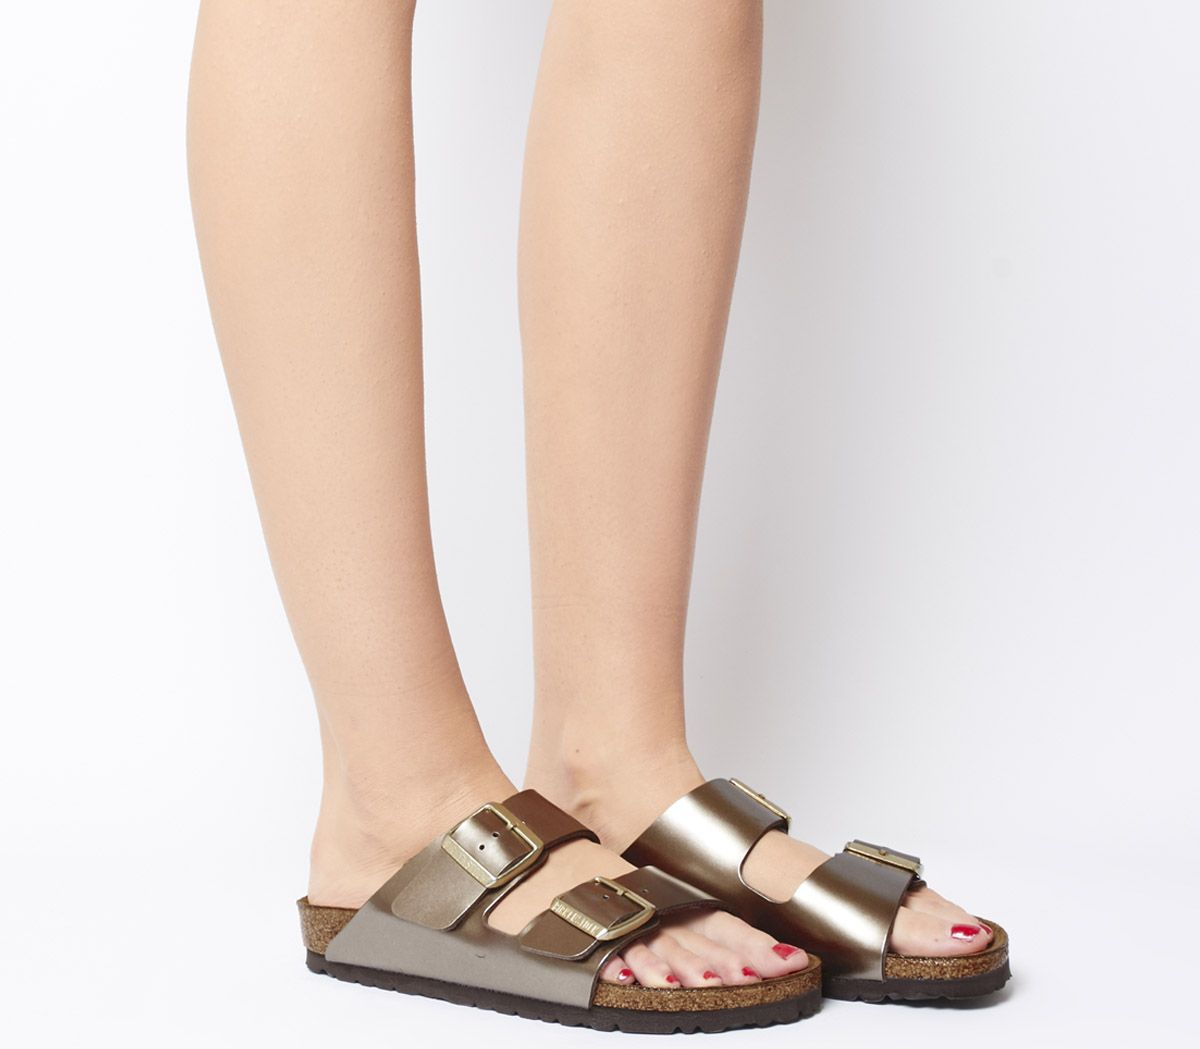 ec219cd86c506 Birkenstock Arizona Two Strap Sandals Electric Metallic Taupe - Sandals